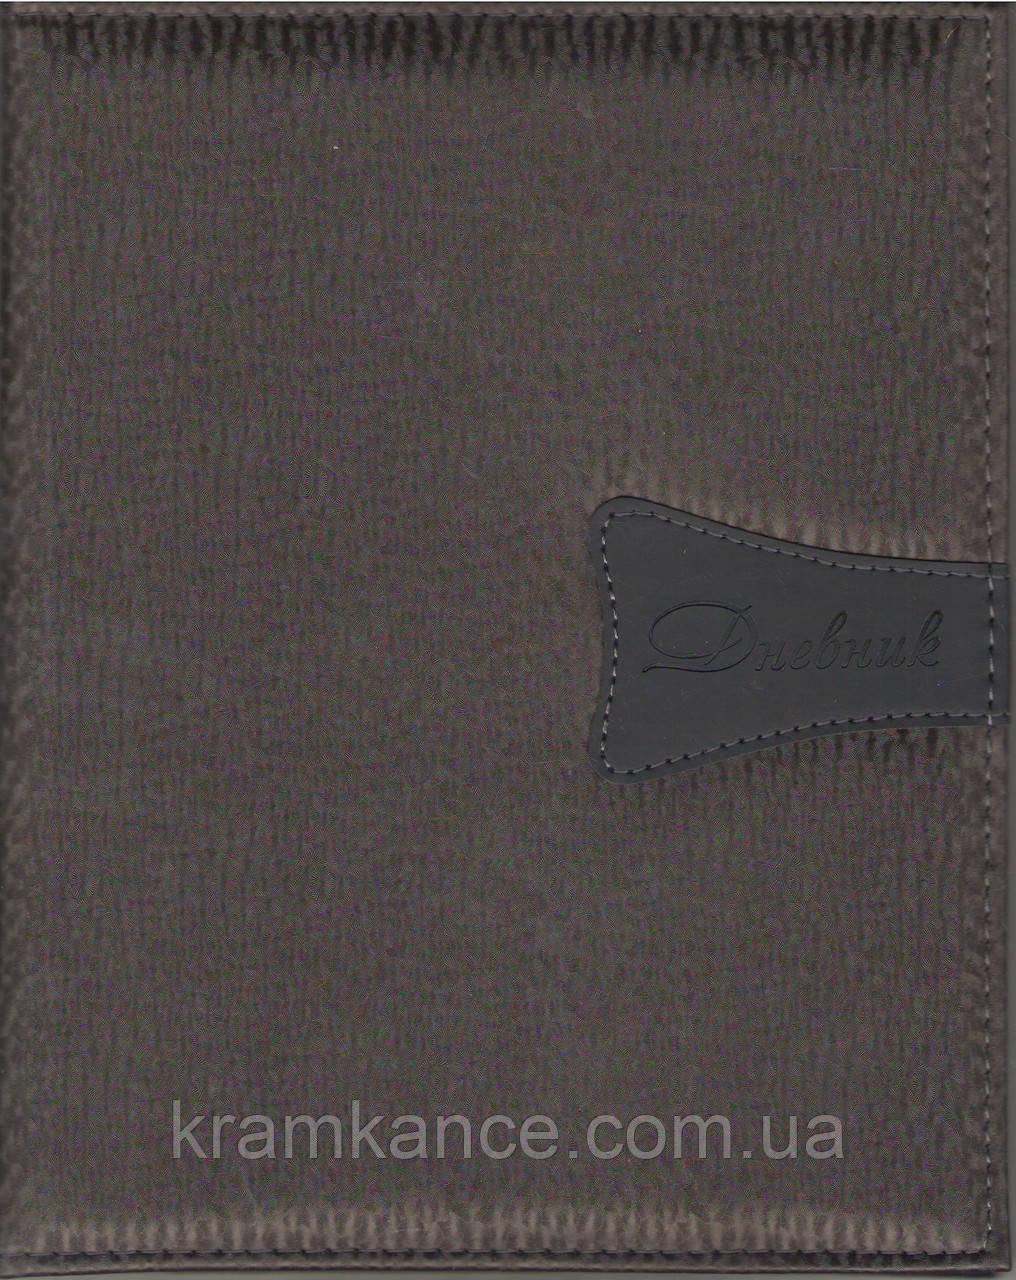 Дневник МАНДАРИН 48 листов кожзам №6143-10